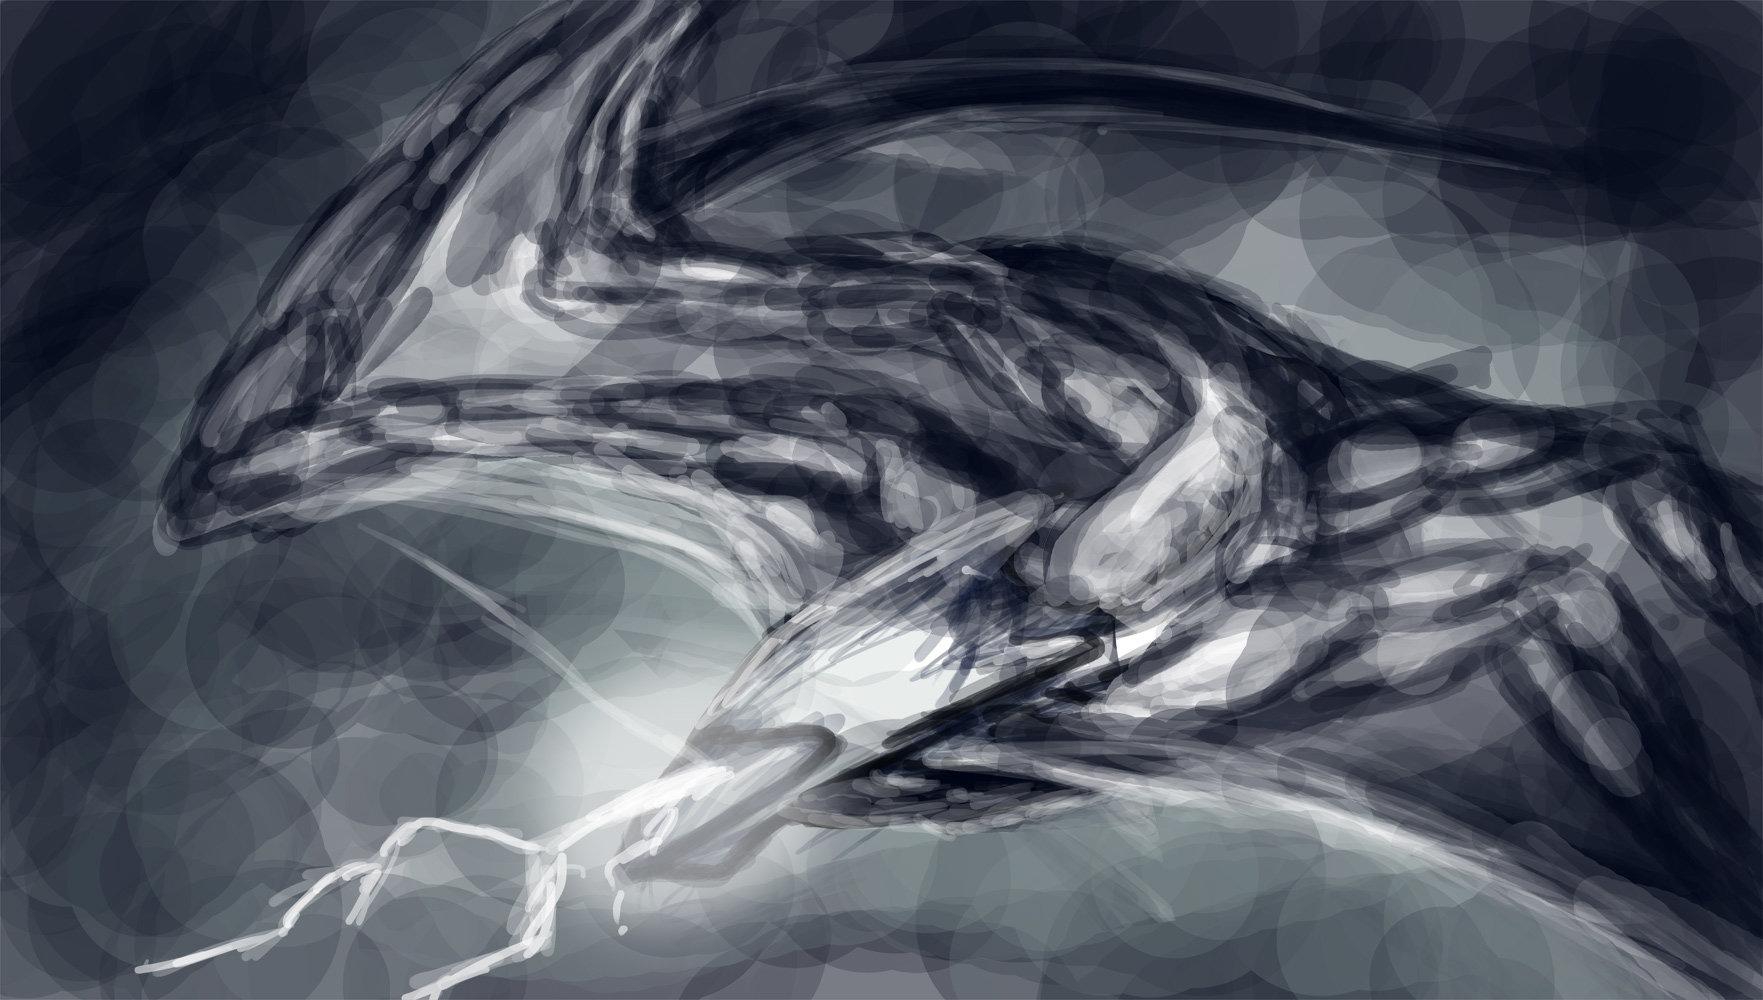 Orm irian stormdragon01